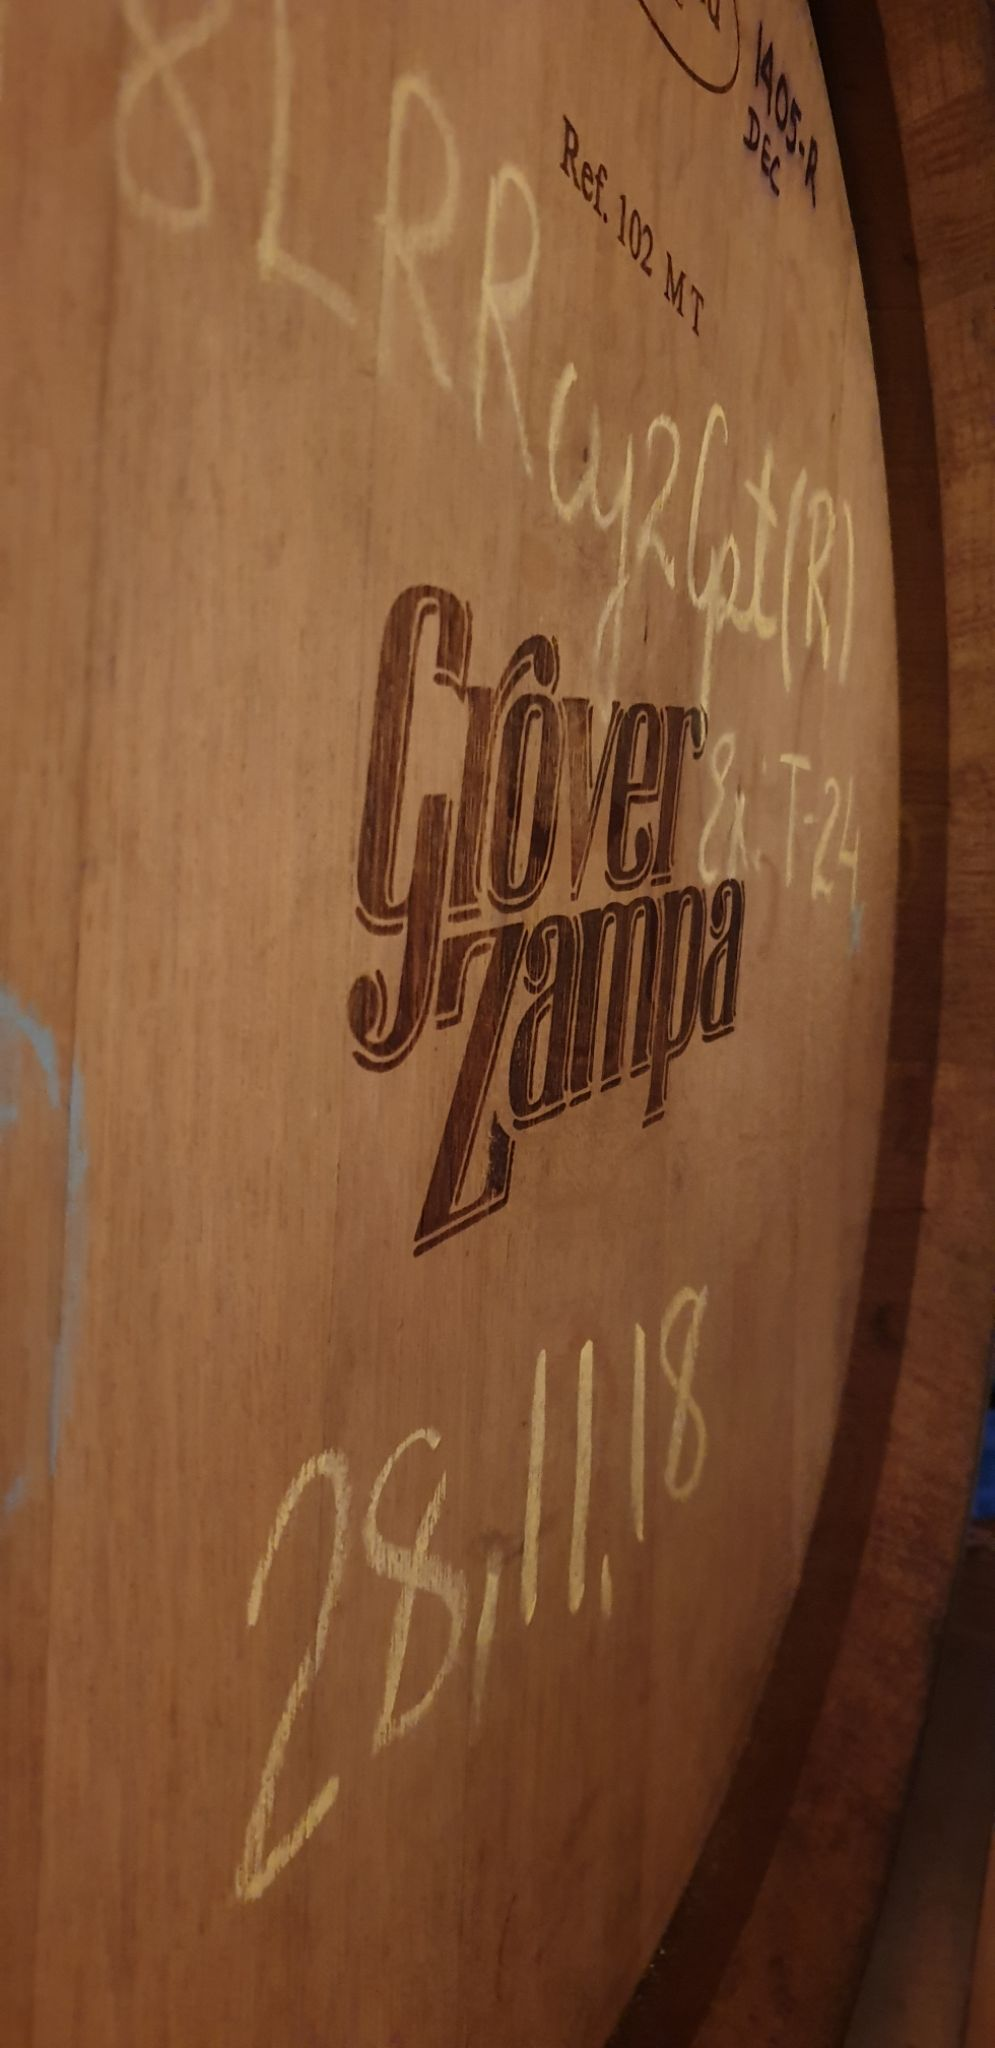 Photo of Grover Zampa Vineyards By WanderingBytes